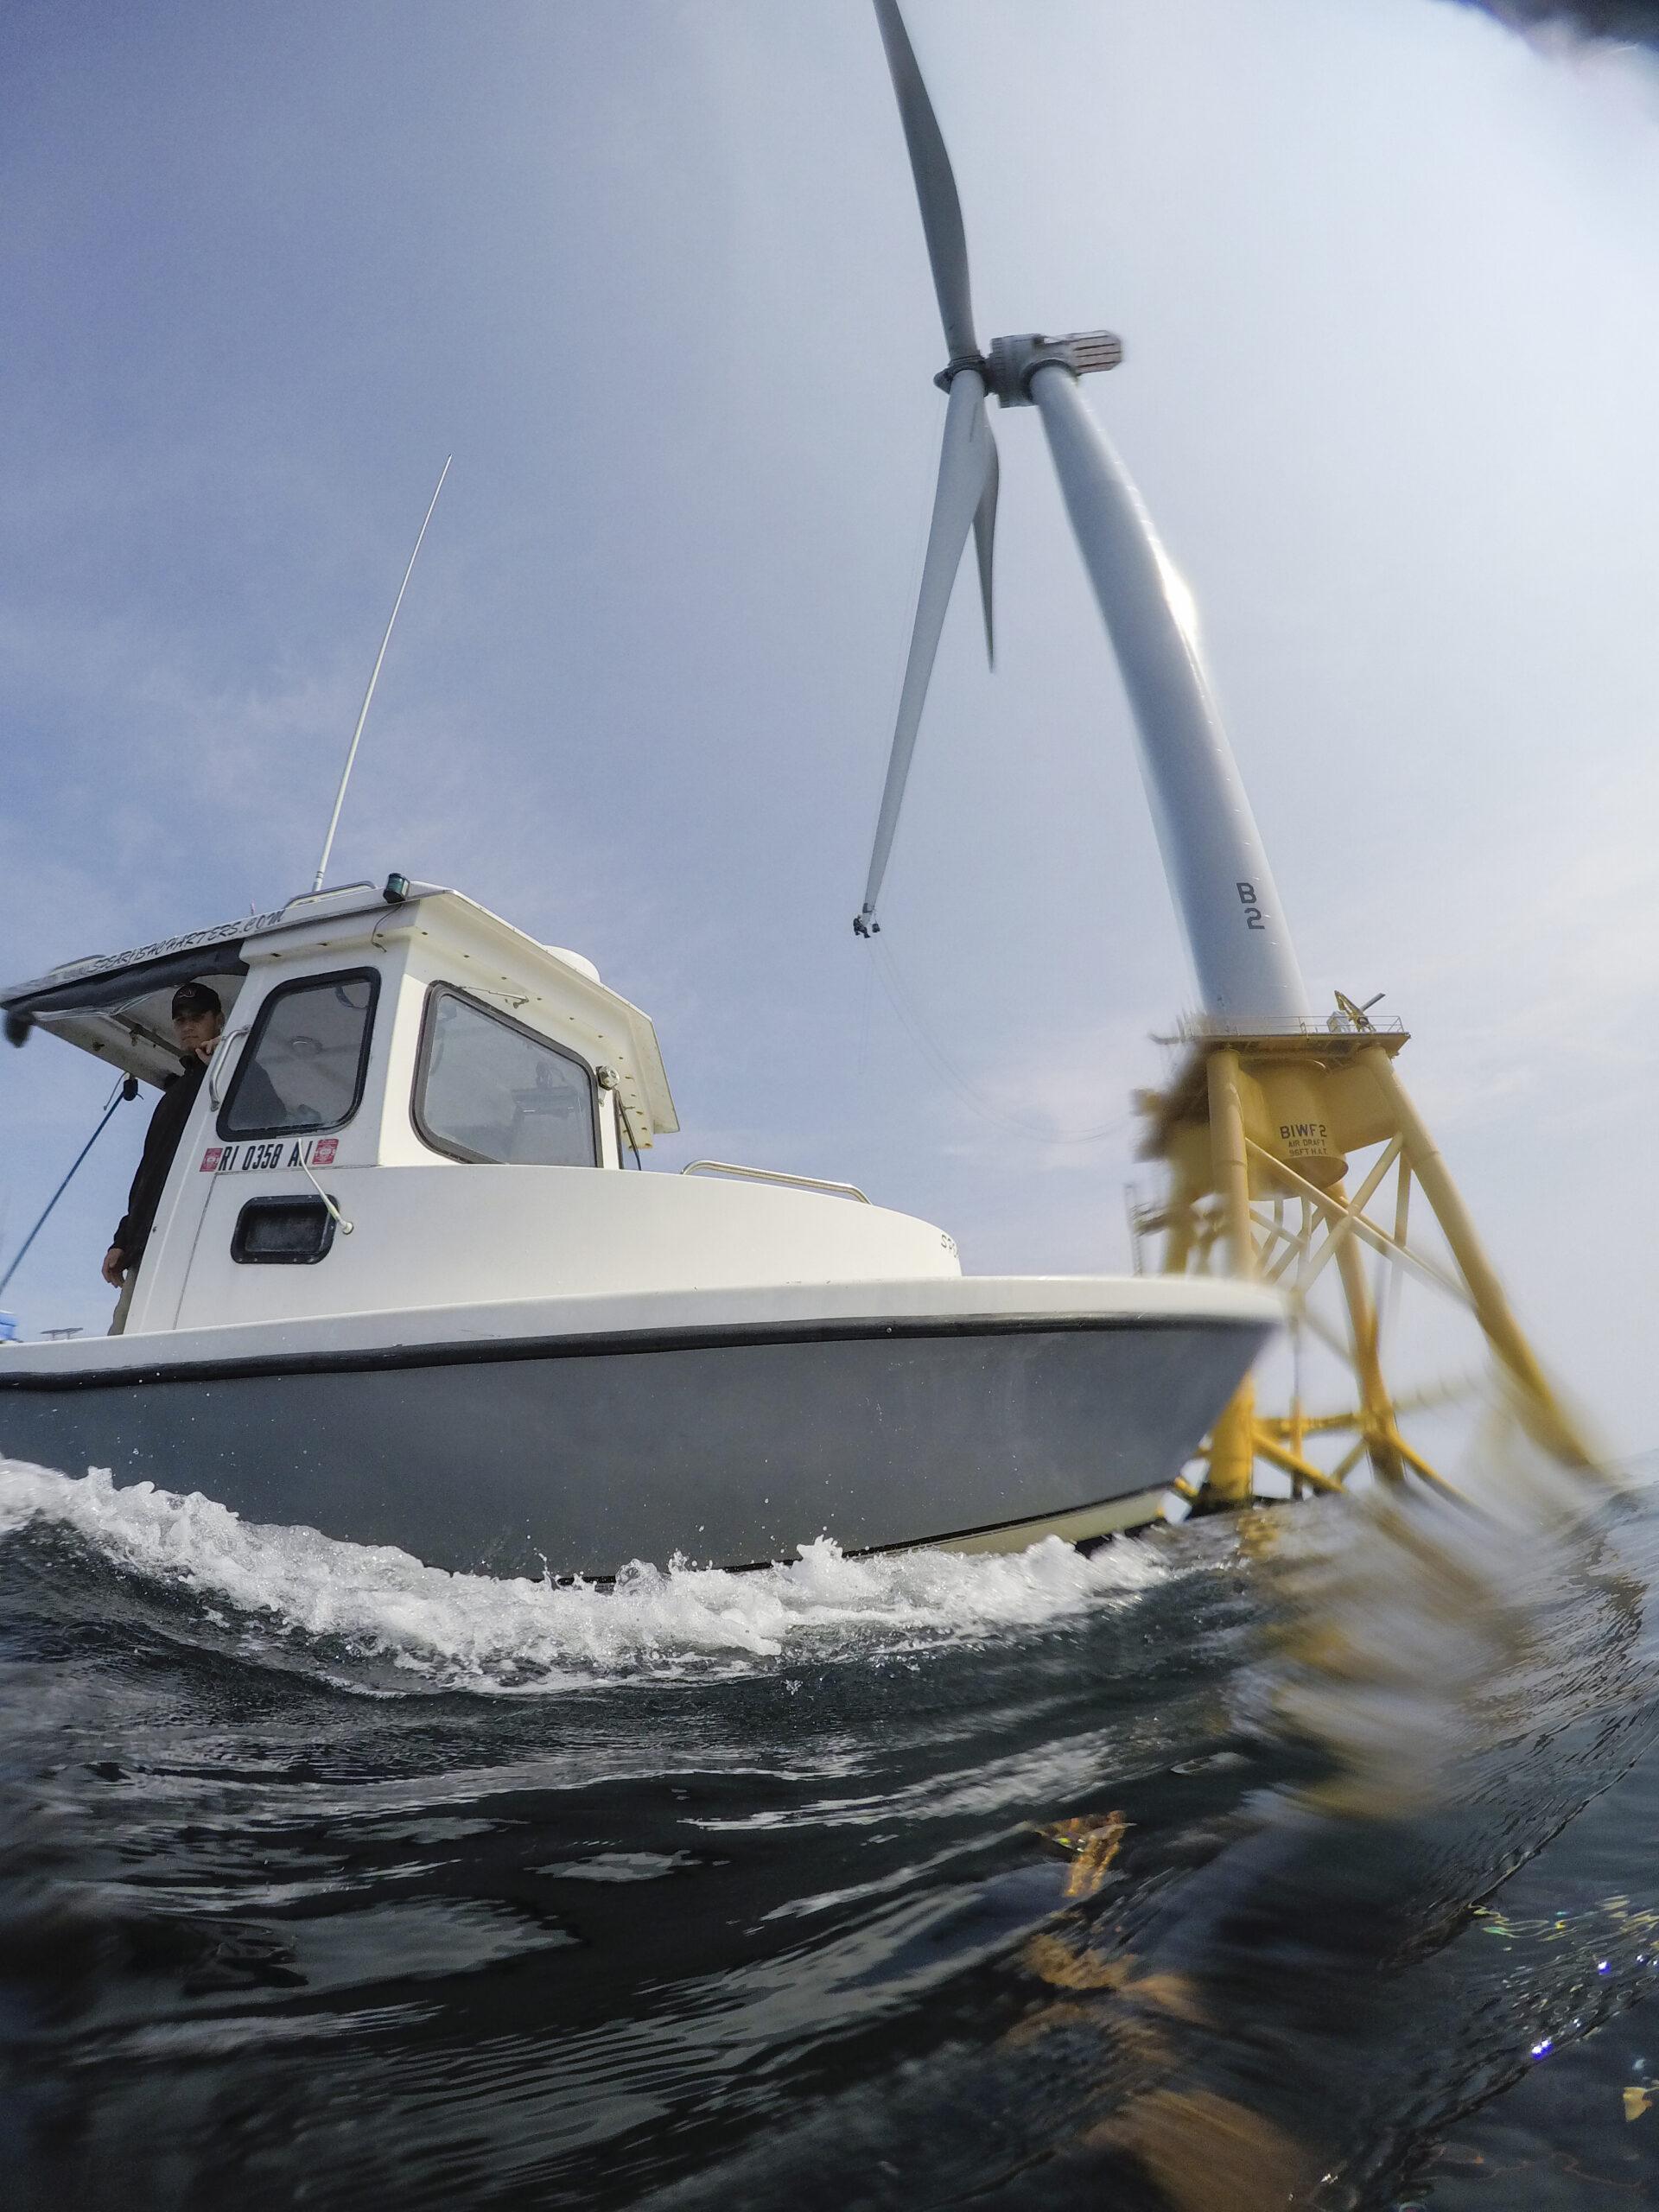 BIock Island Wind Farm, courtesy of Charlie Nutting Photography.